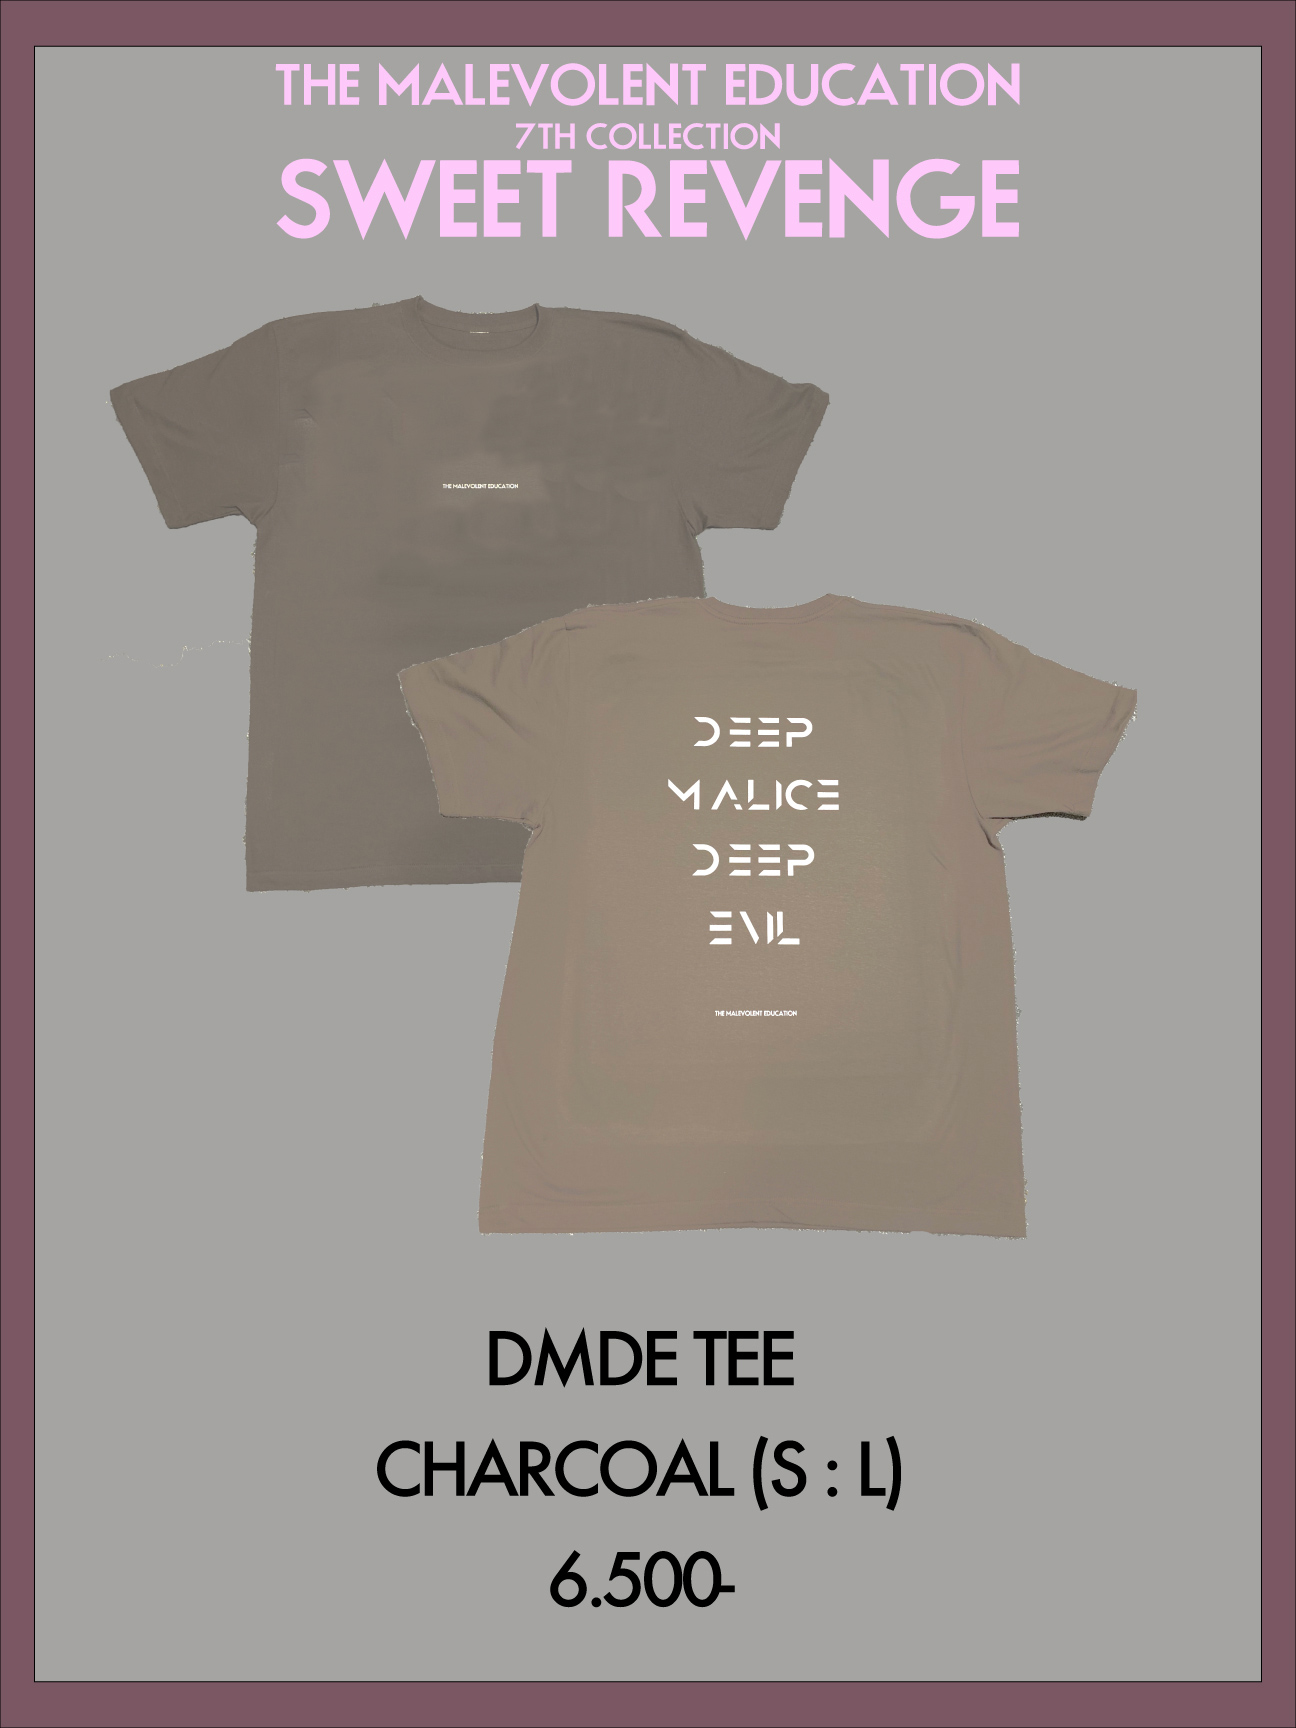 DMDE TEE (CHARCOAL) S / L